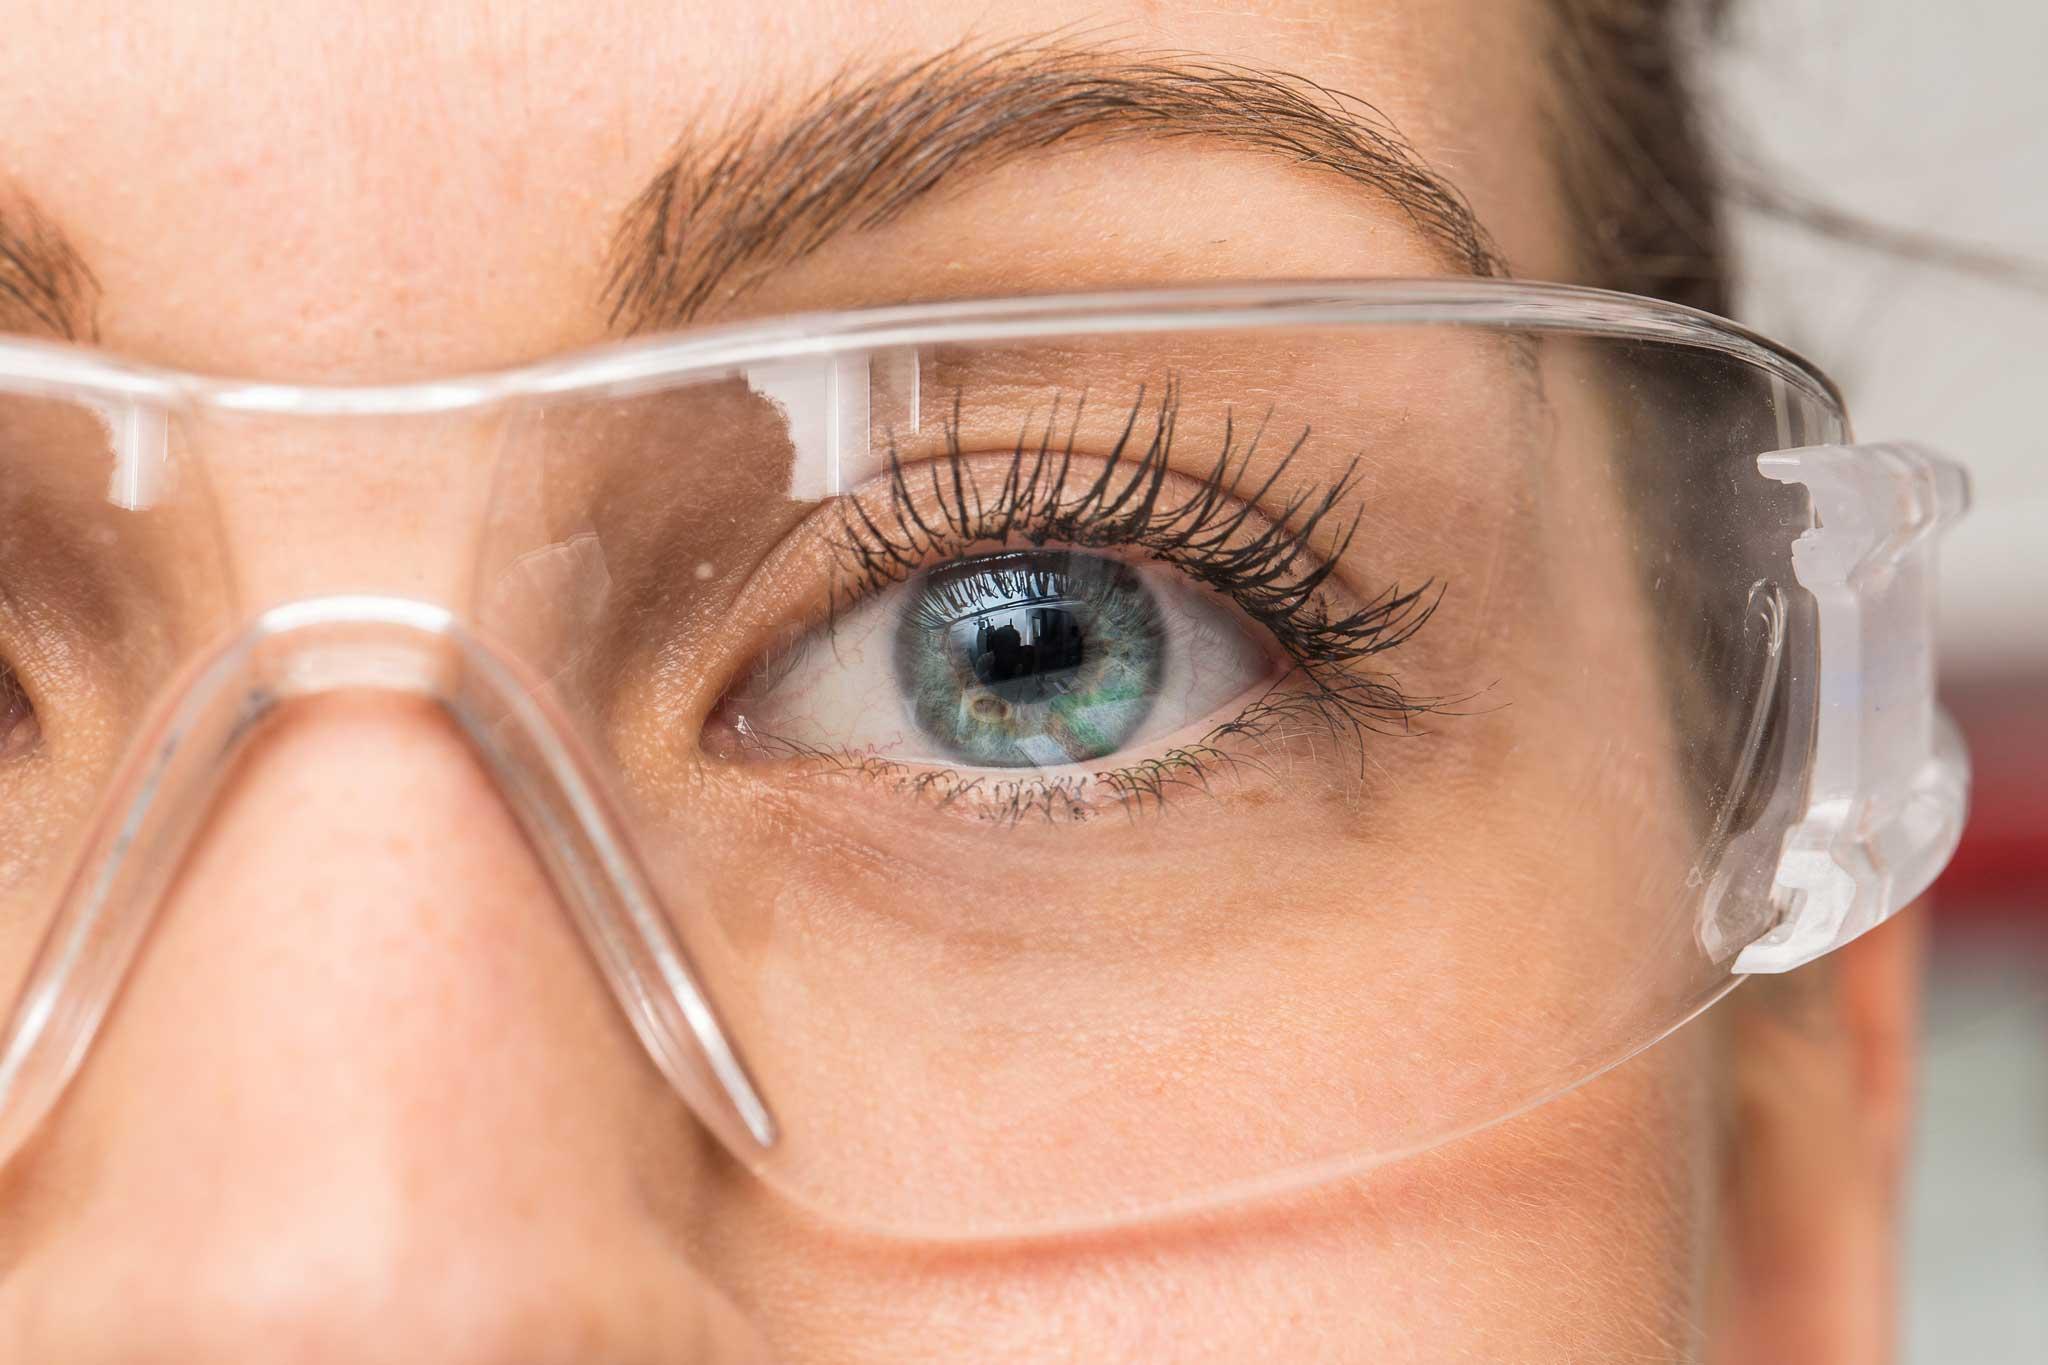 Protective Eyewear & Your Prosthesis – 3 Eye Protection Tips